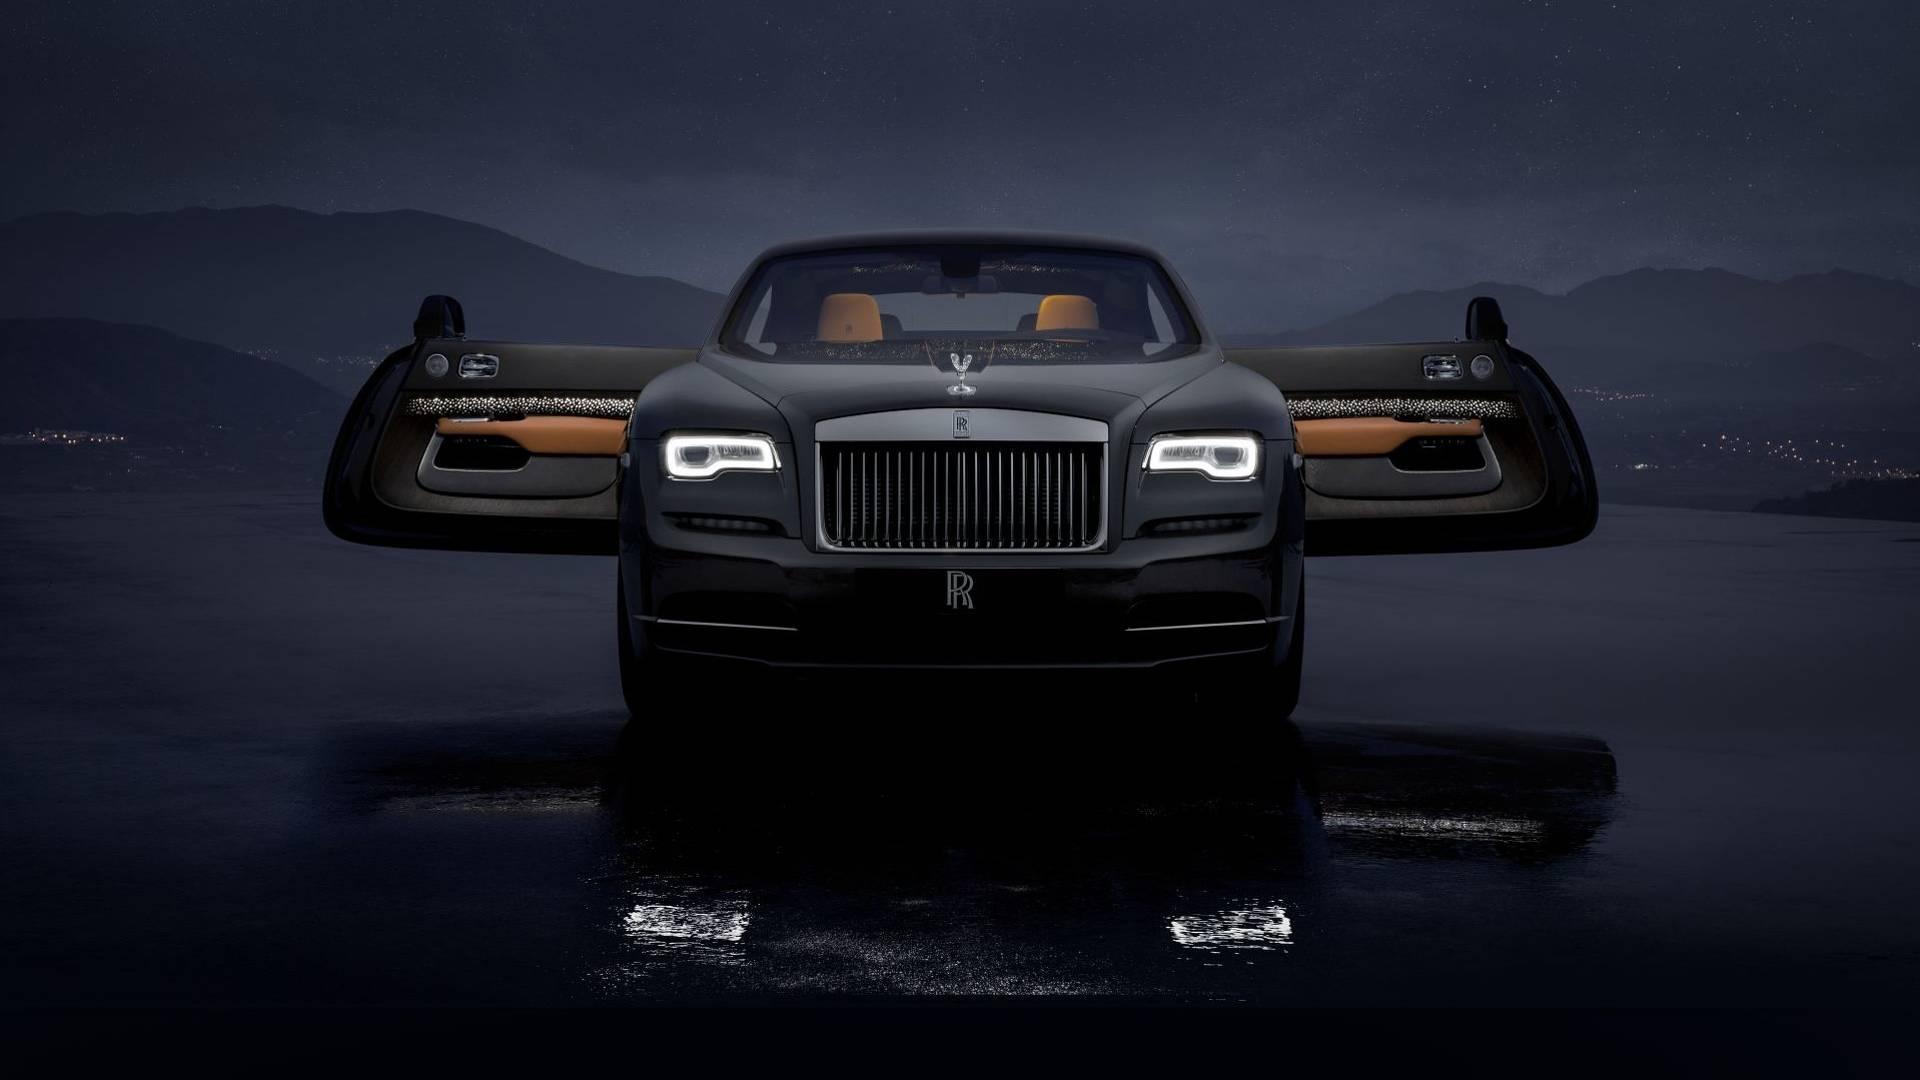 ferrari luxury sport rome car speciale hire rental aaa new rent